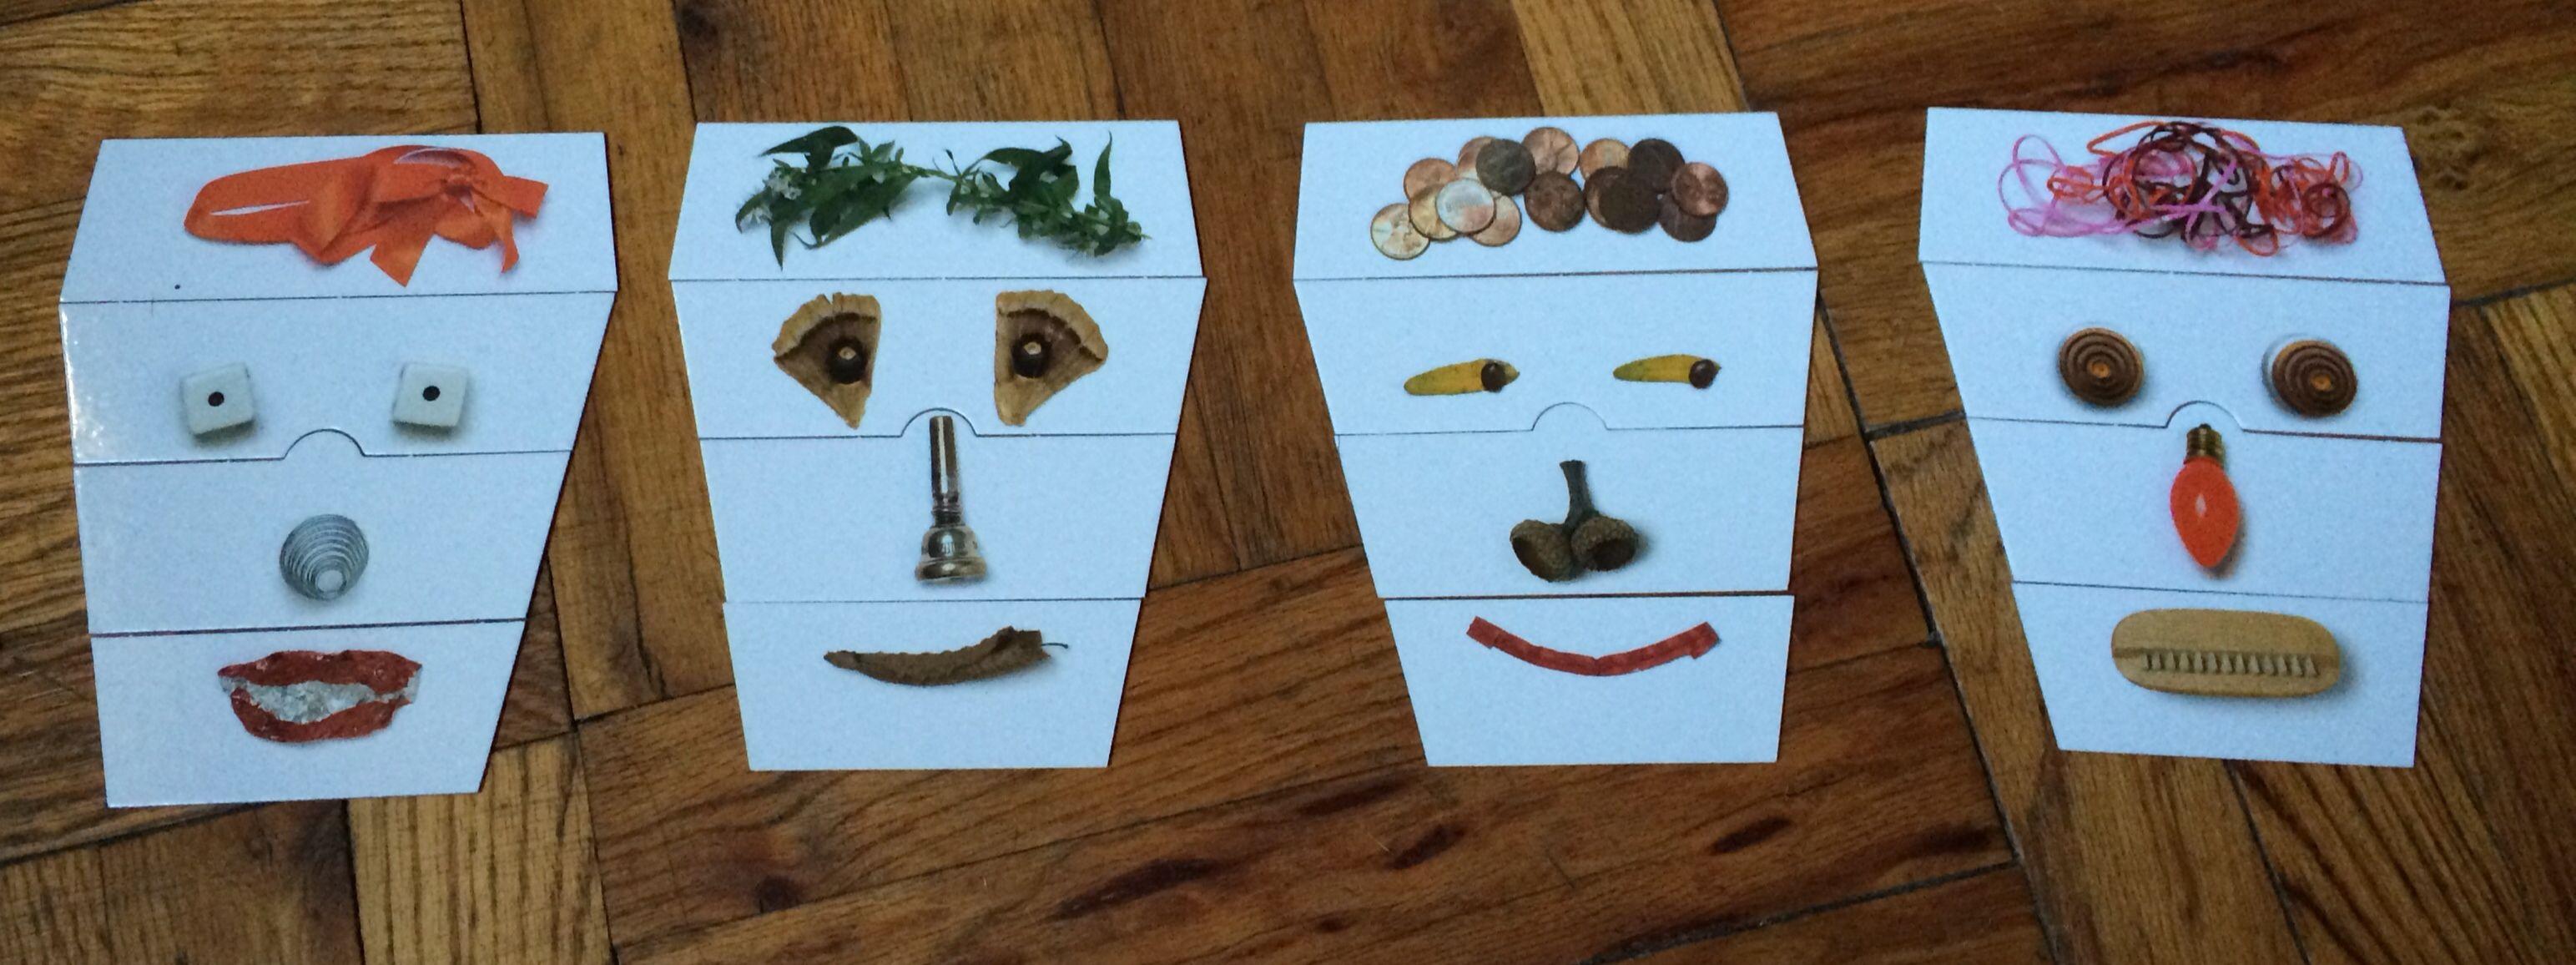 Teach Through Games About Face